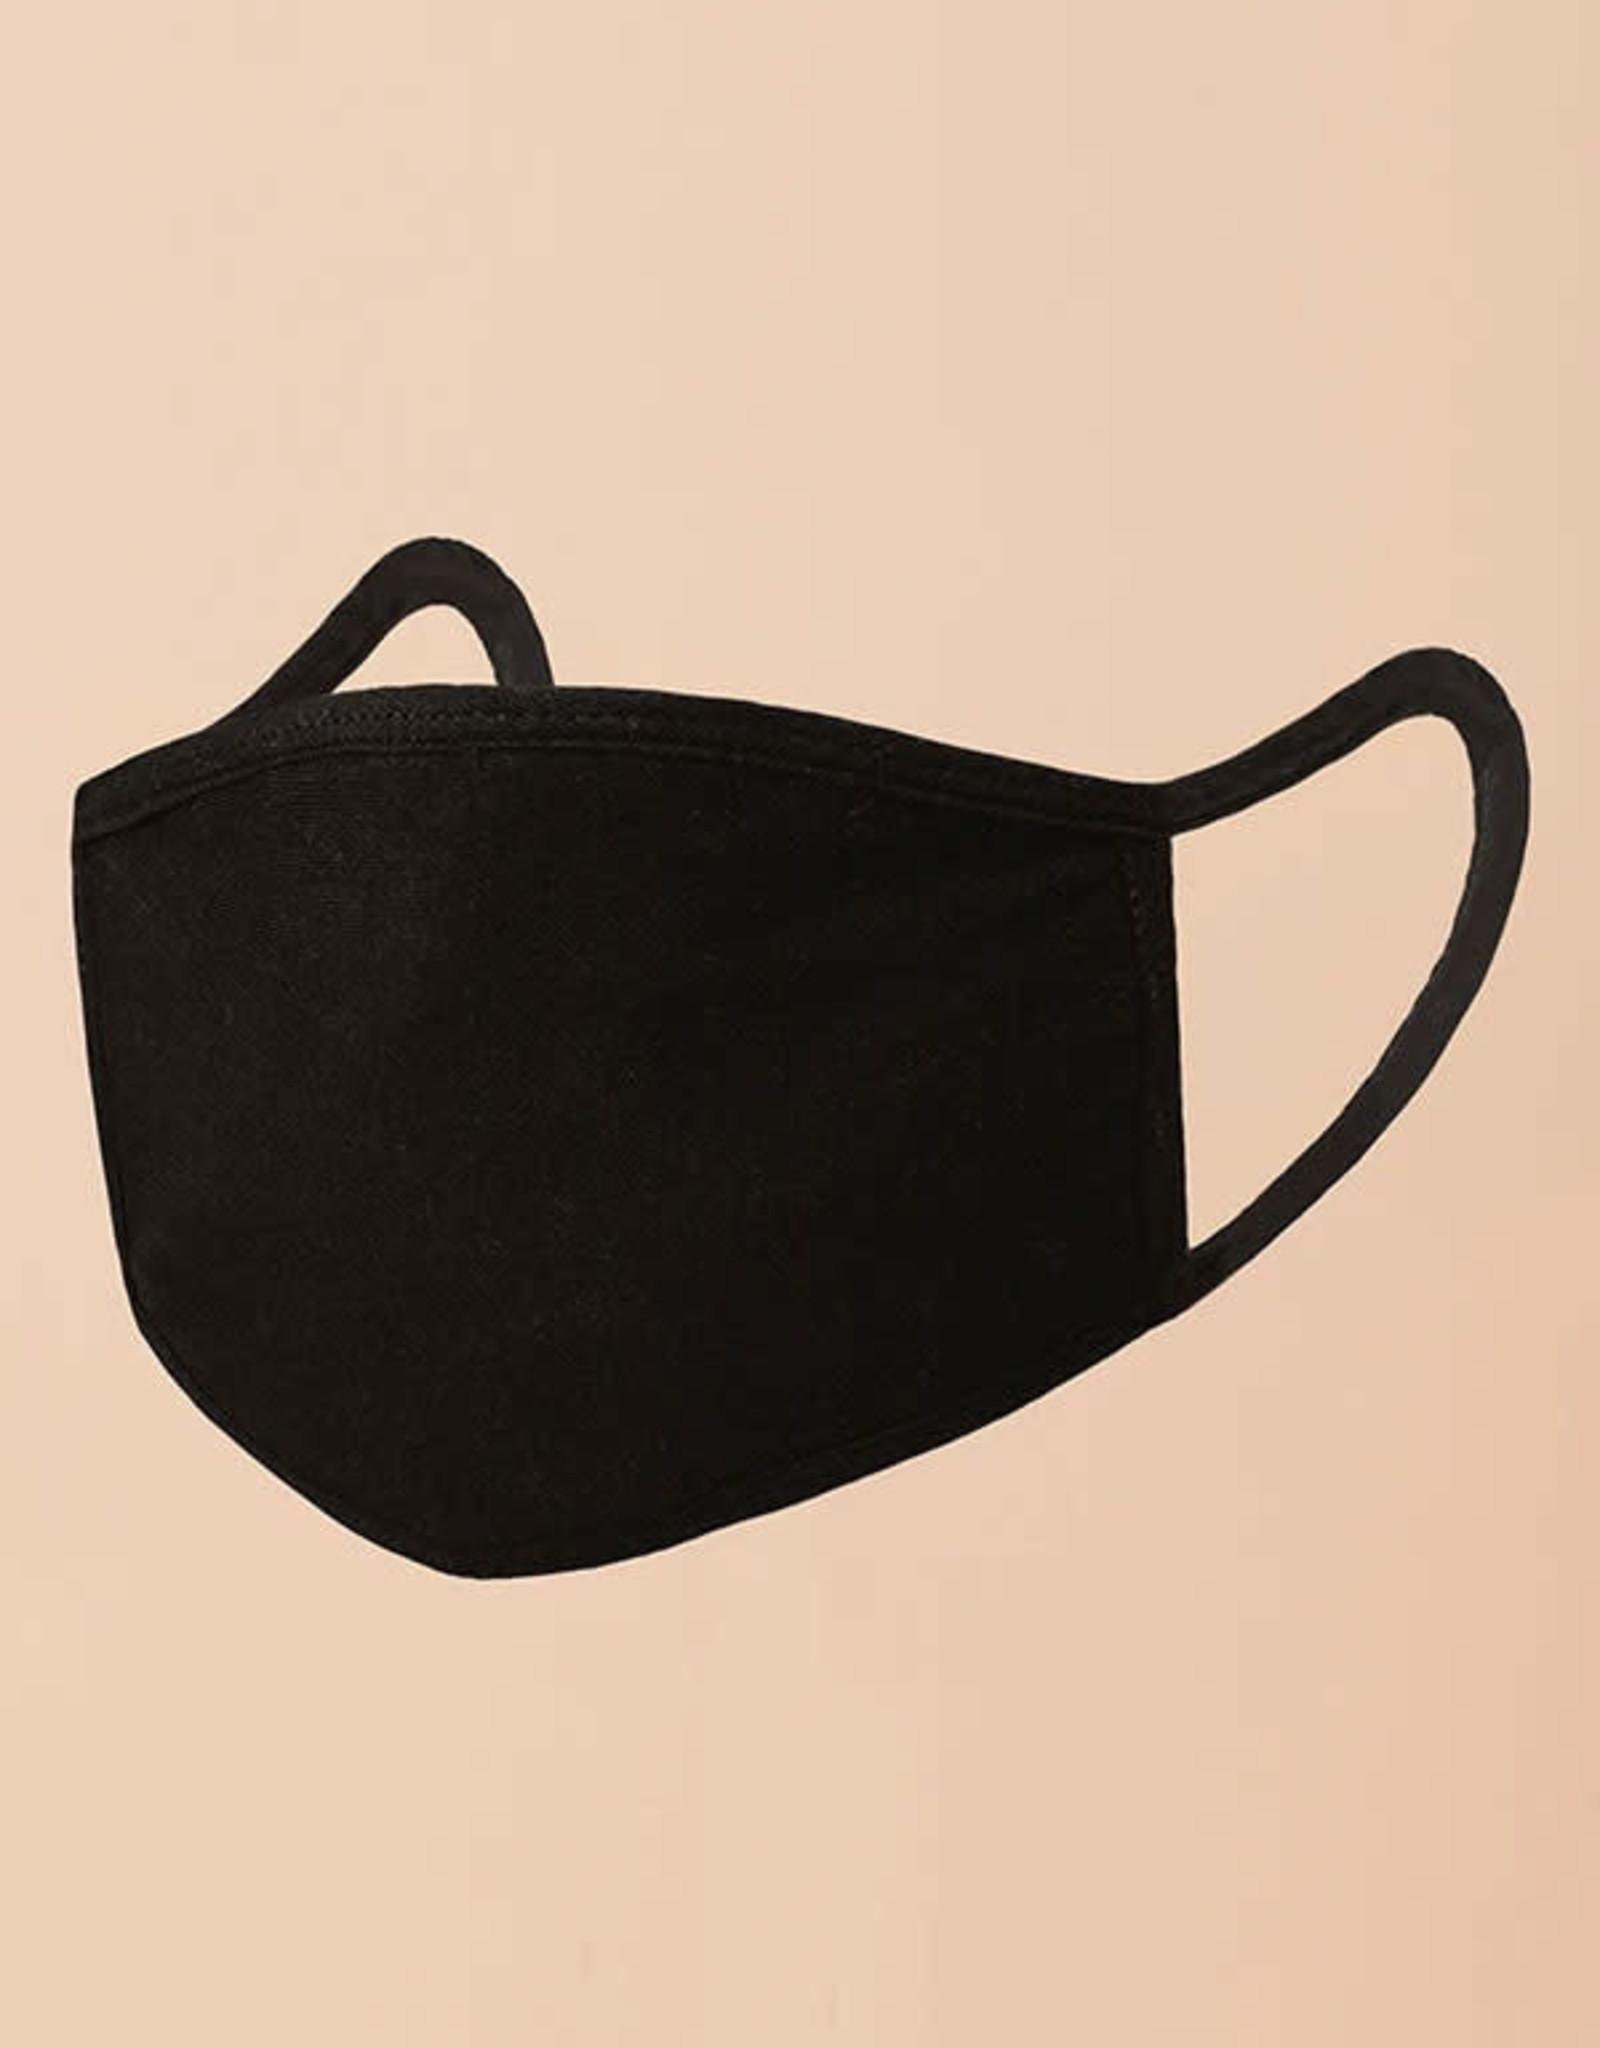 HYFVE 2-Layer Cotton/Spandex Mask